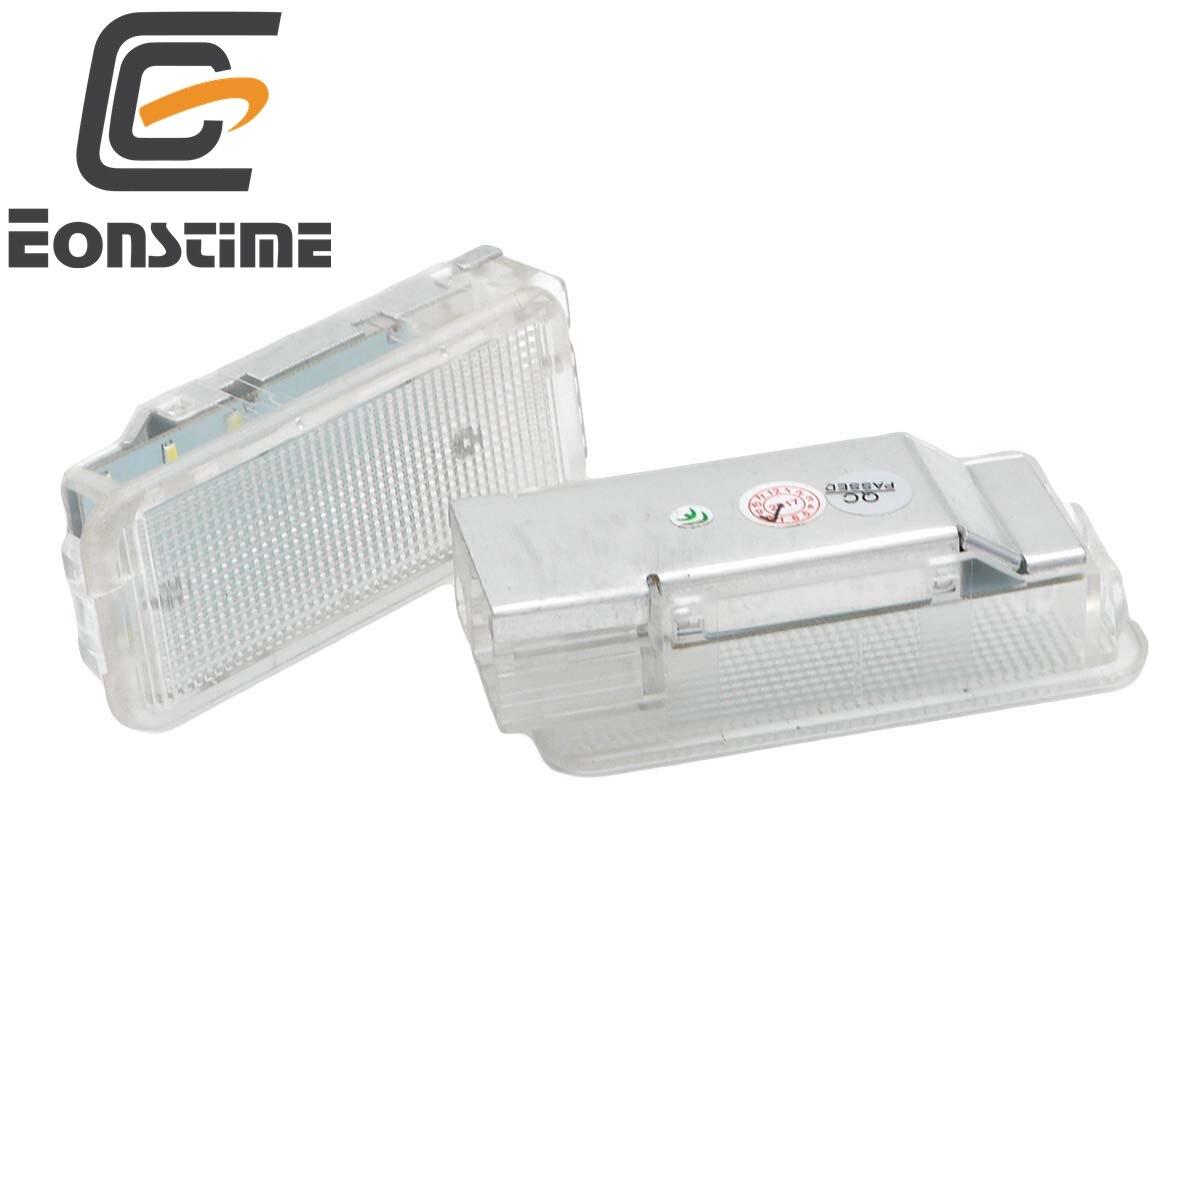 Eonstime 2Pcs 18SMD LED luggage lights car compartment Interior light Lamp For Peugeot 1007 206 207 306 307 3008 406 407 5008